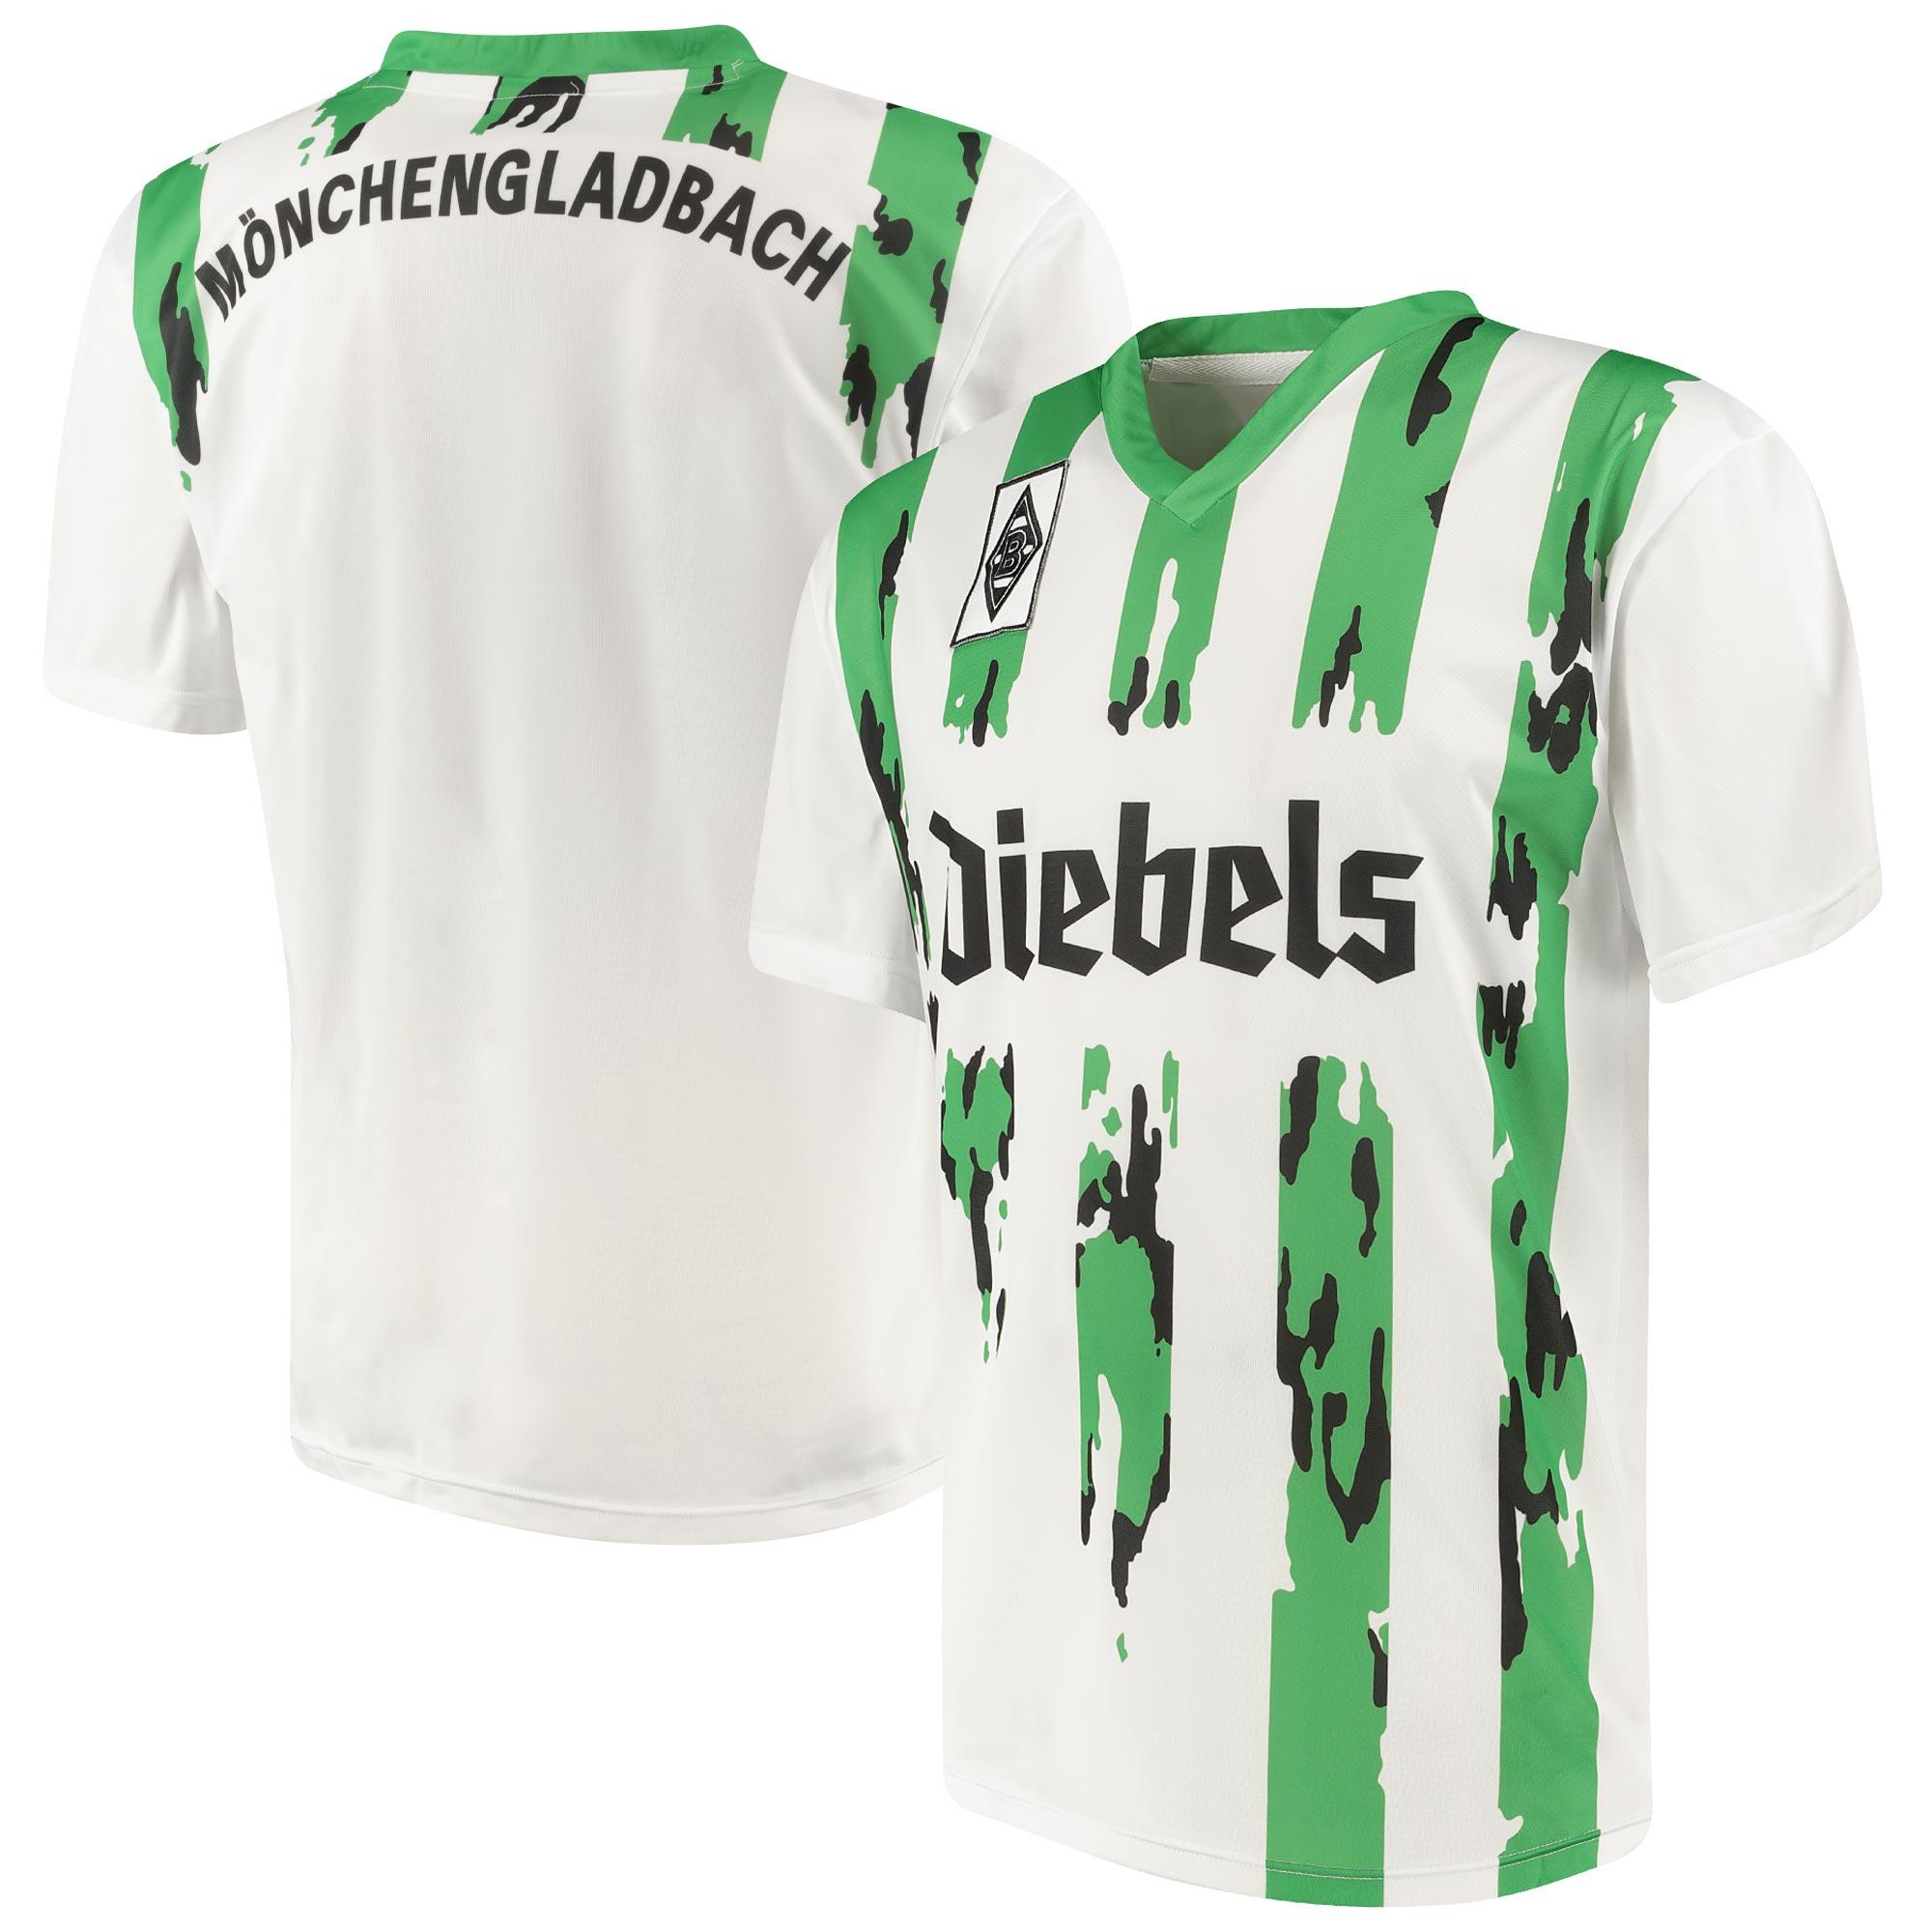 Borussia Monchengladbach 1995 Home Cup Final Shirt